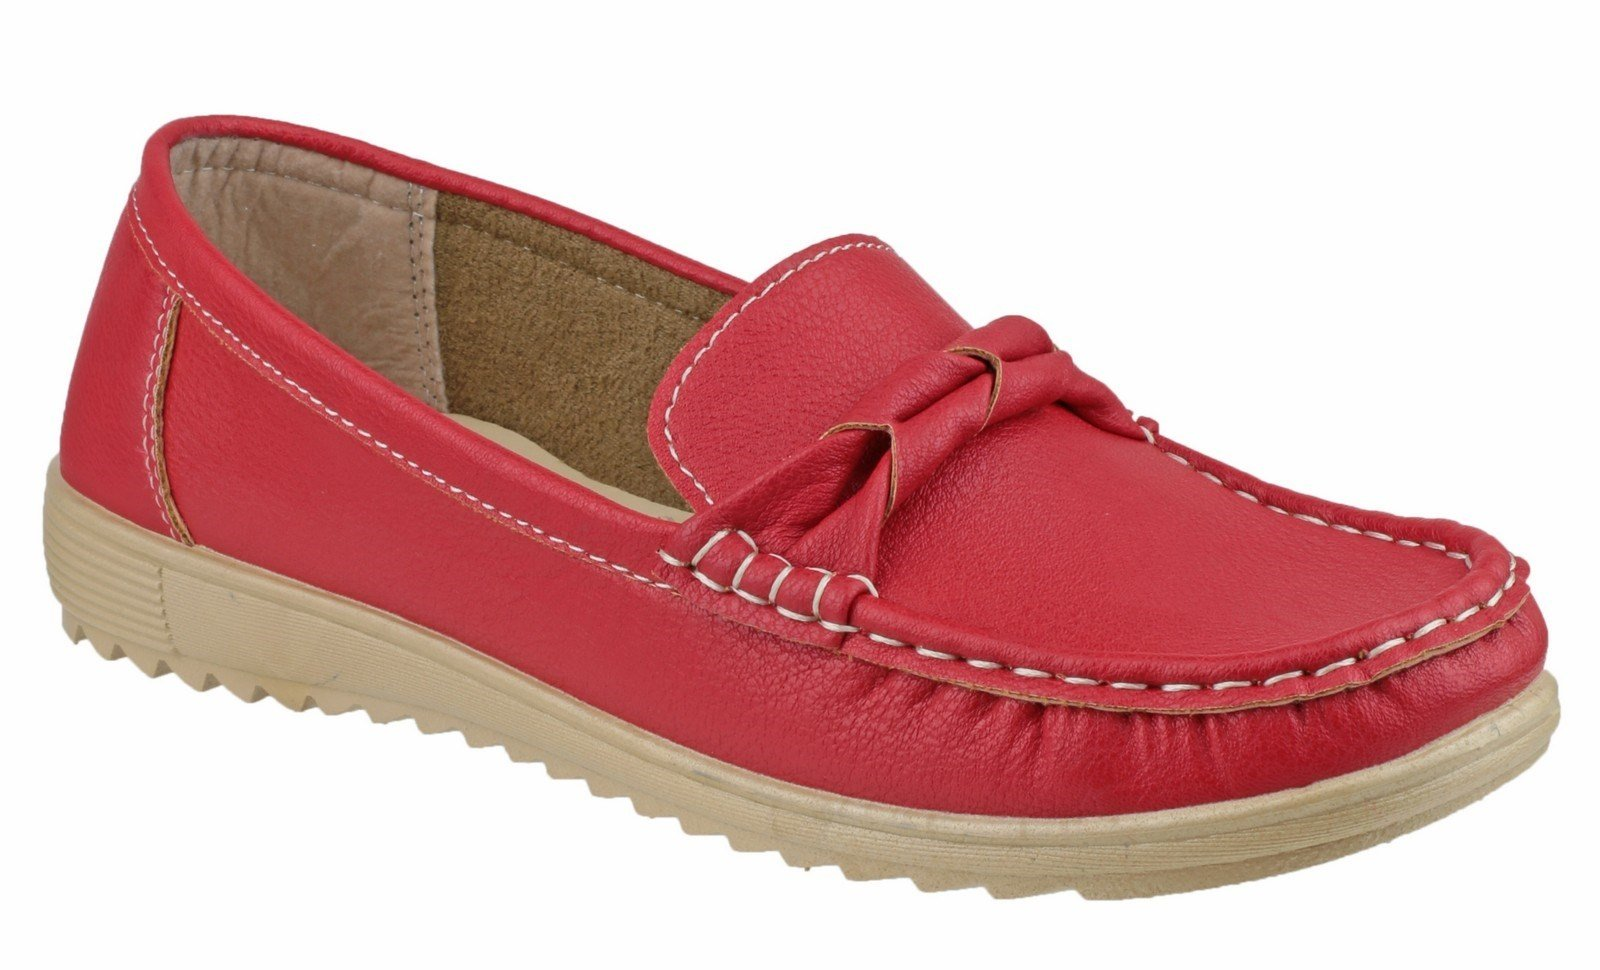 Fleet & Foster Women's Paros Loafer Various Colours 20938-33257 - Red 3